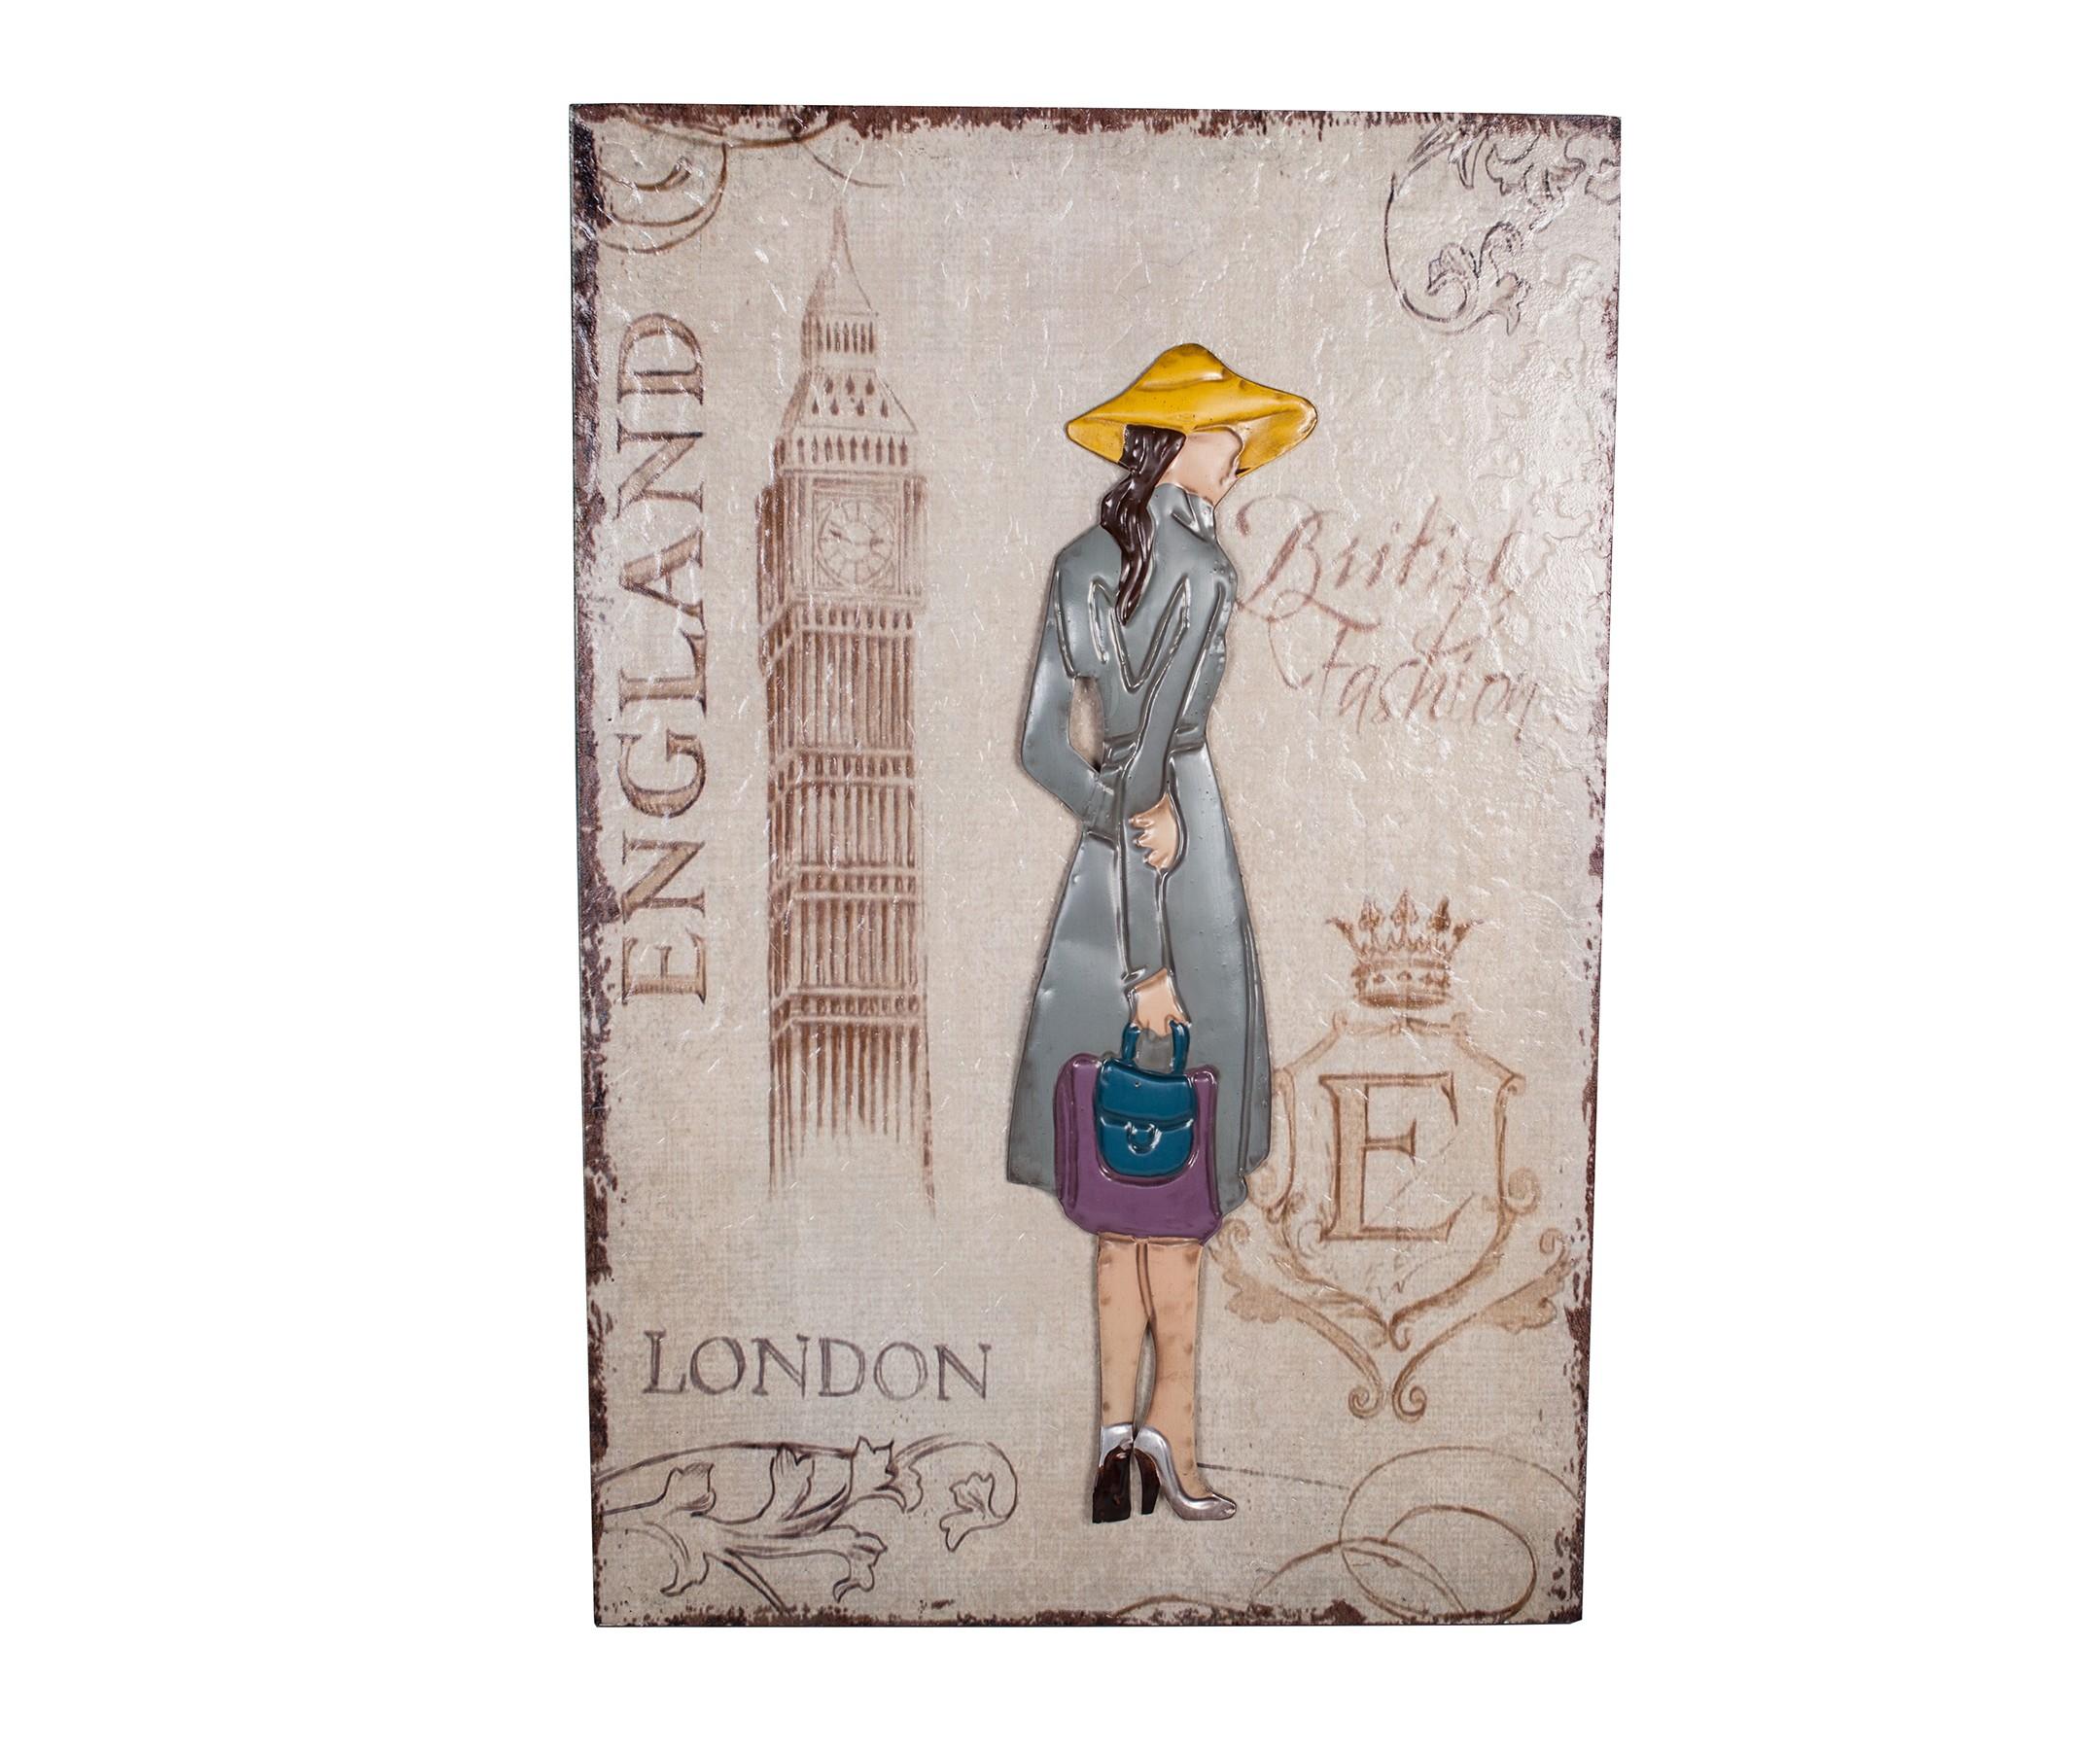 Декоративное настенное панно London GirlПанно<br>Материал:&amp;amp;nbsp;МДФ, Ткань<br><br>Material: МДФ<br>Width см: 39<br>Depth см: 3<br>Height см: 60